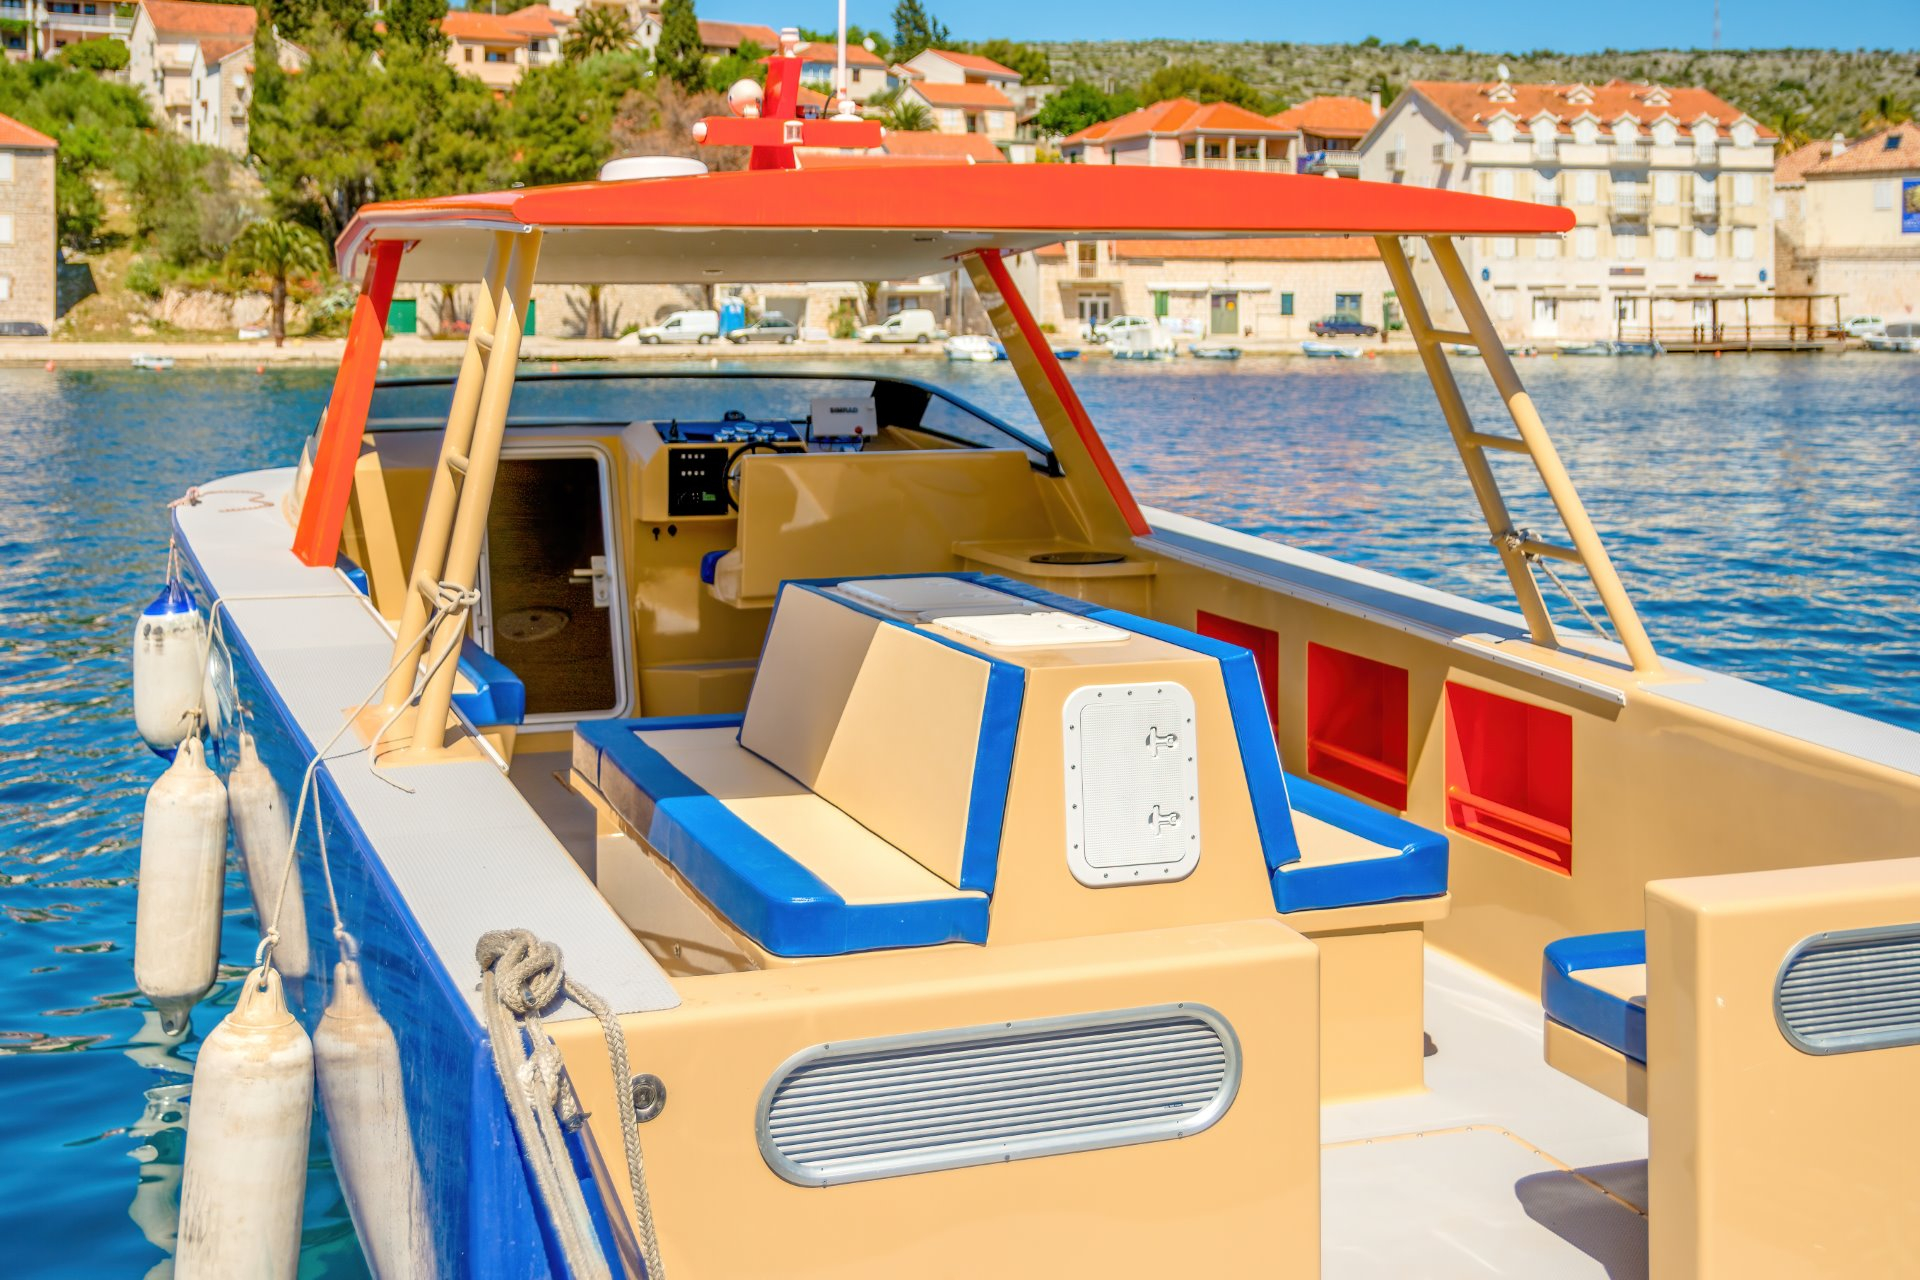 Interieur of luxury boat